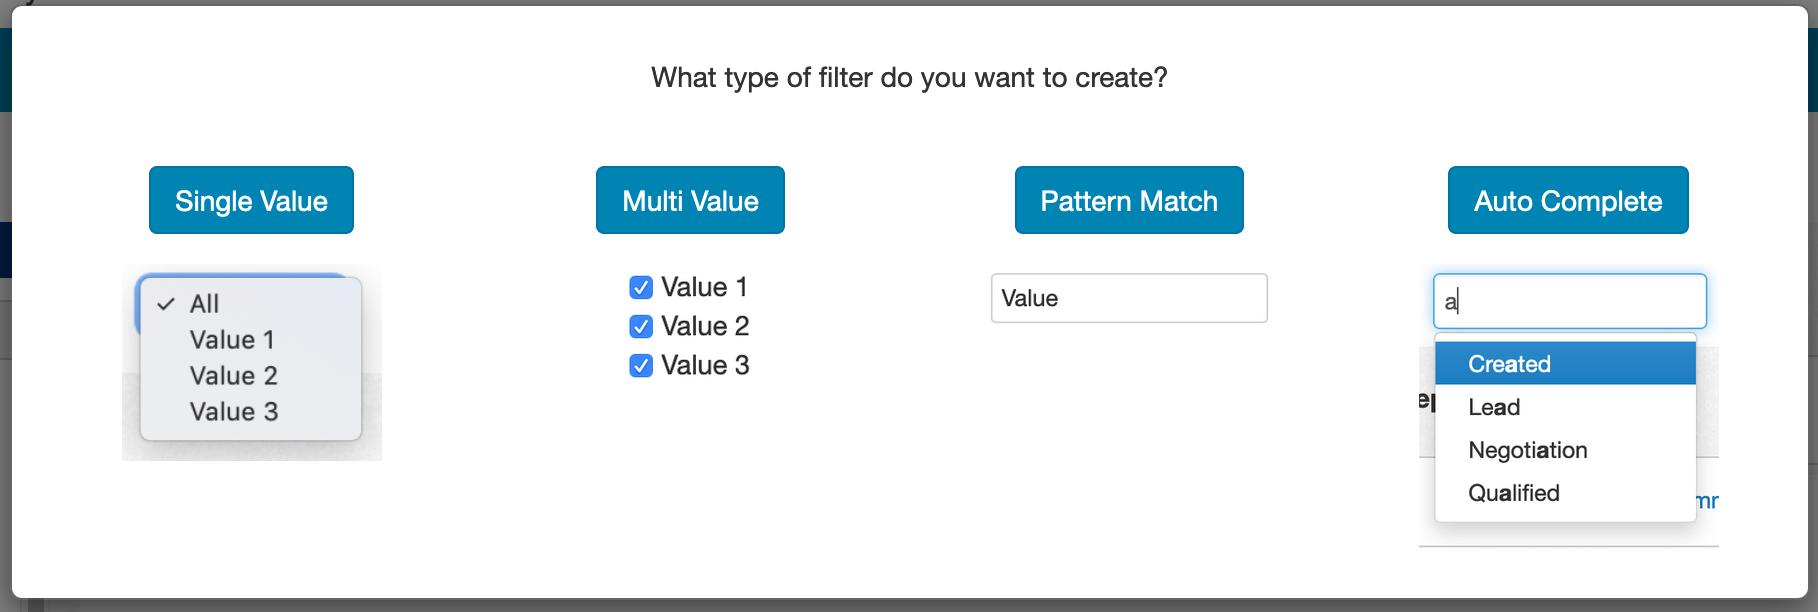 Auto Complete Filter Setup